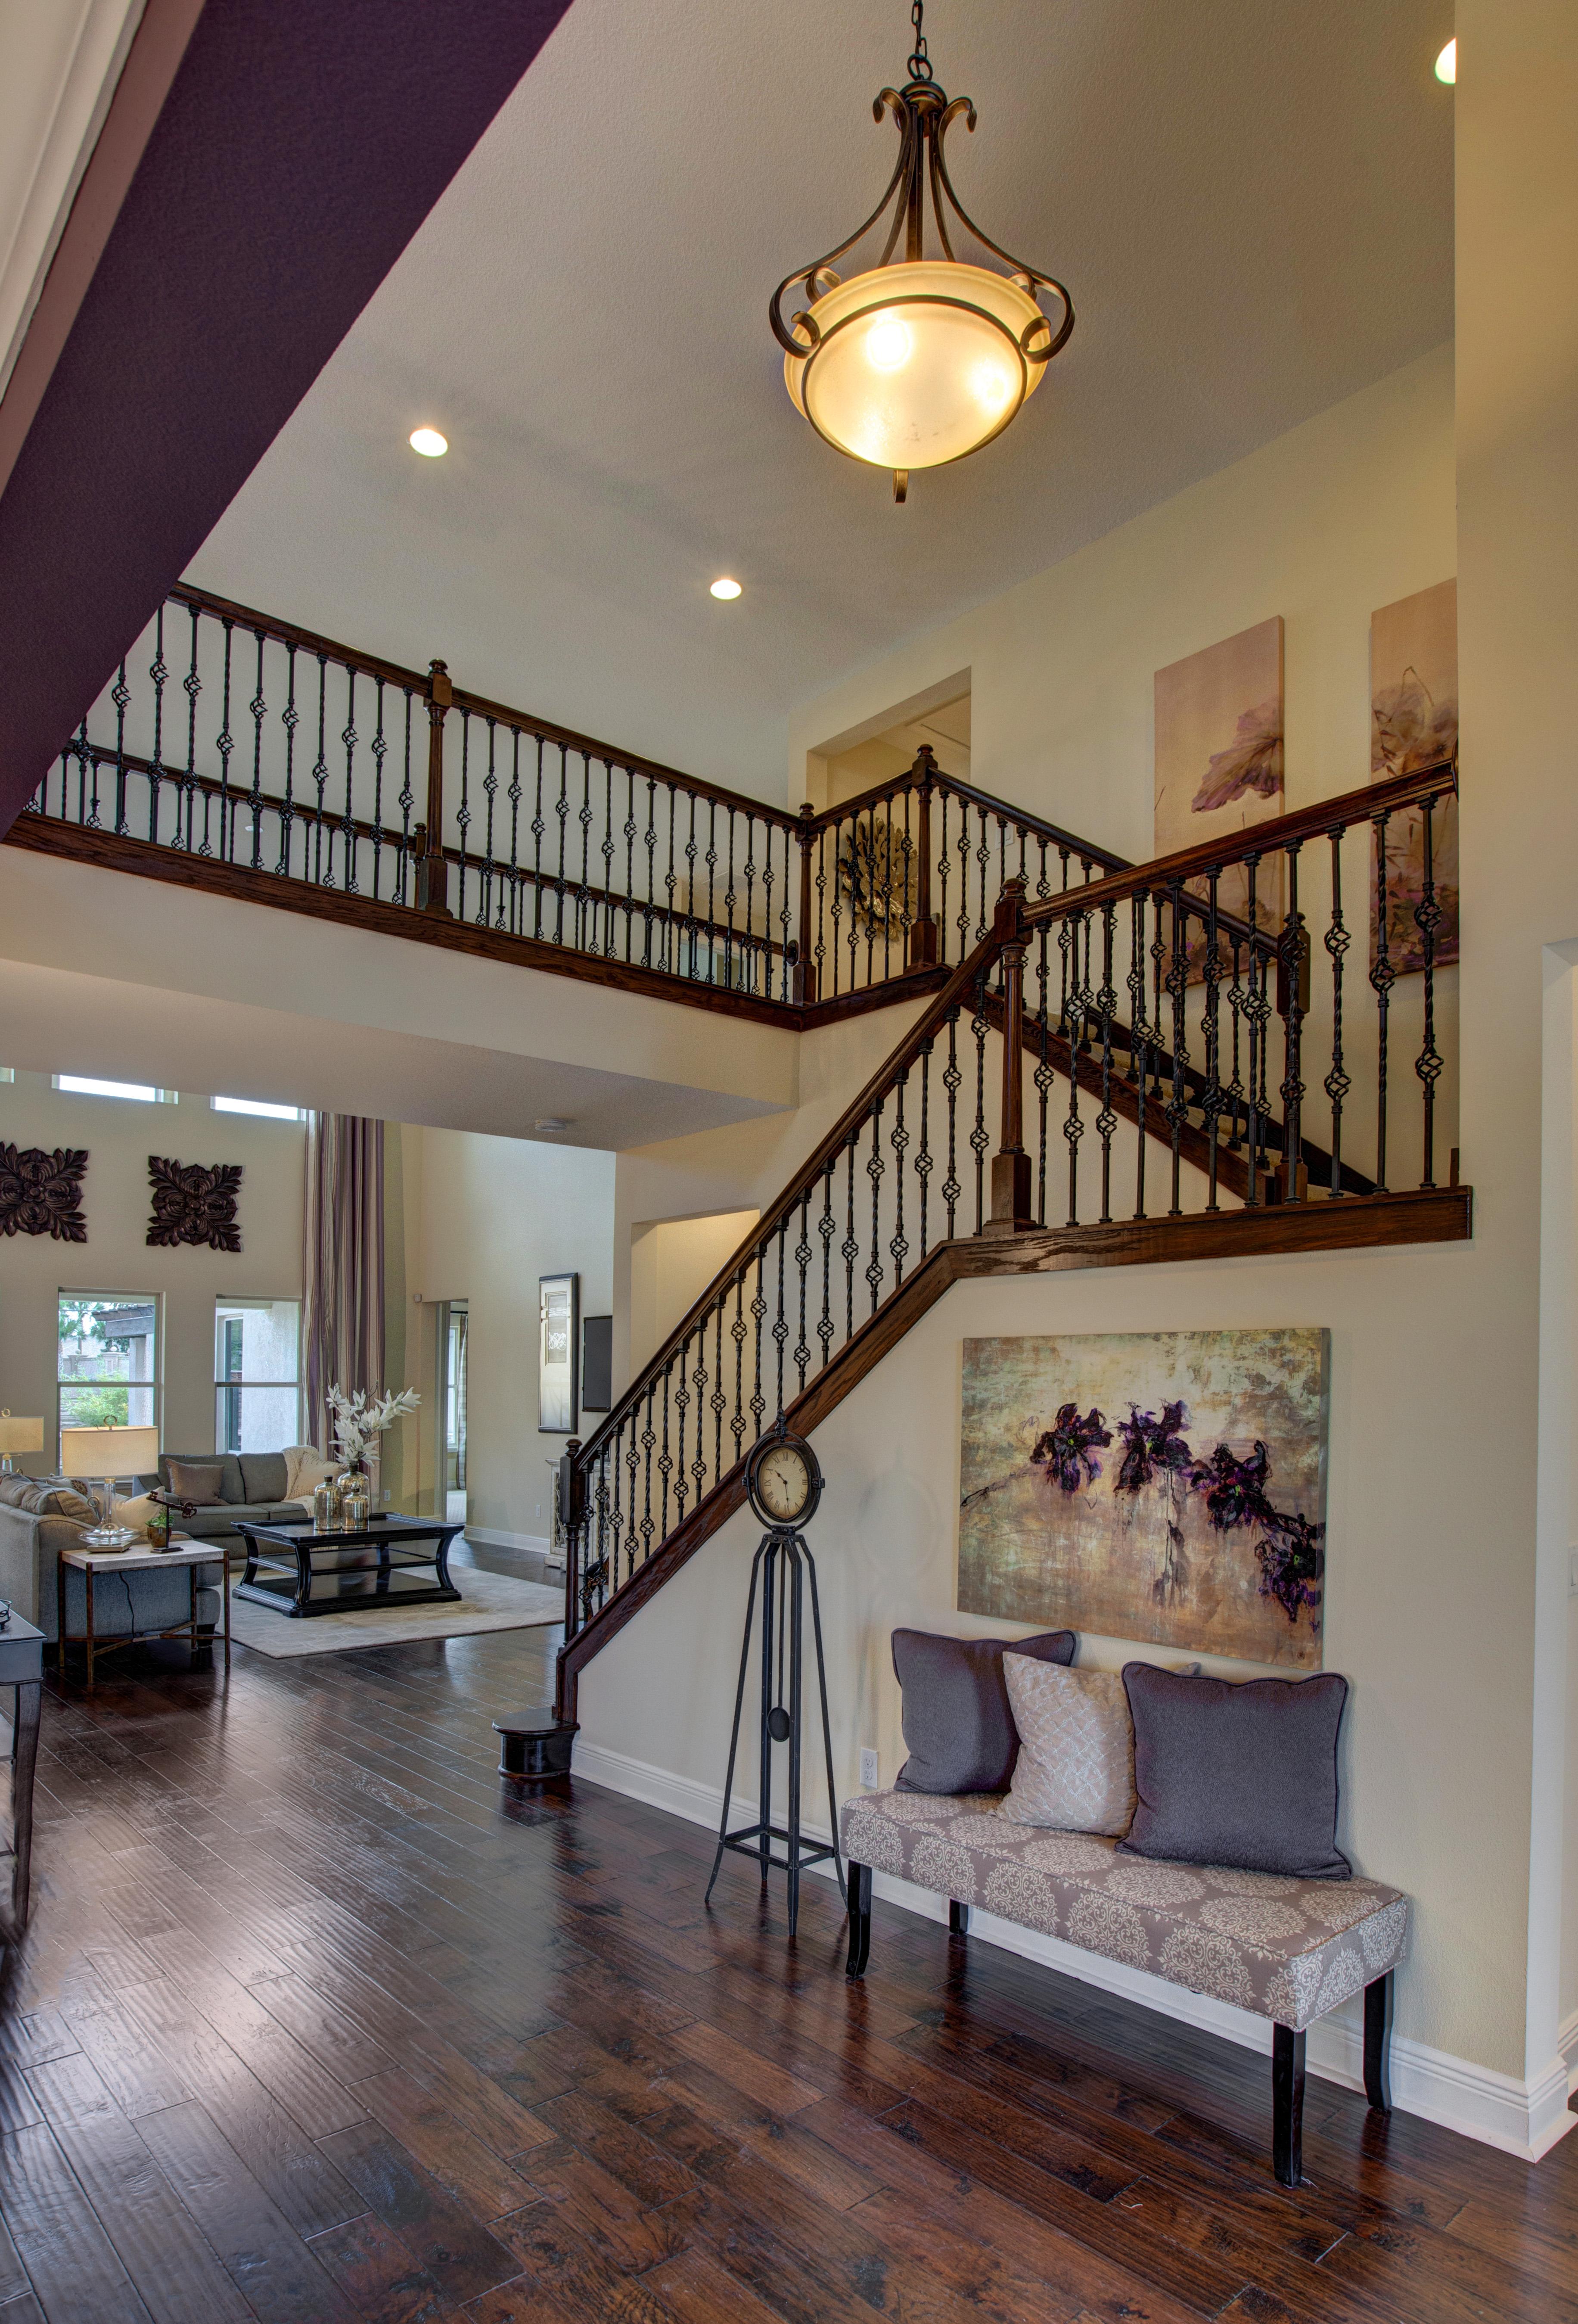 beazer homes washington model winter garden new home. Black Bedroom Furniture Sets. Home Design Ideas